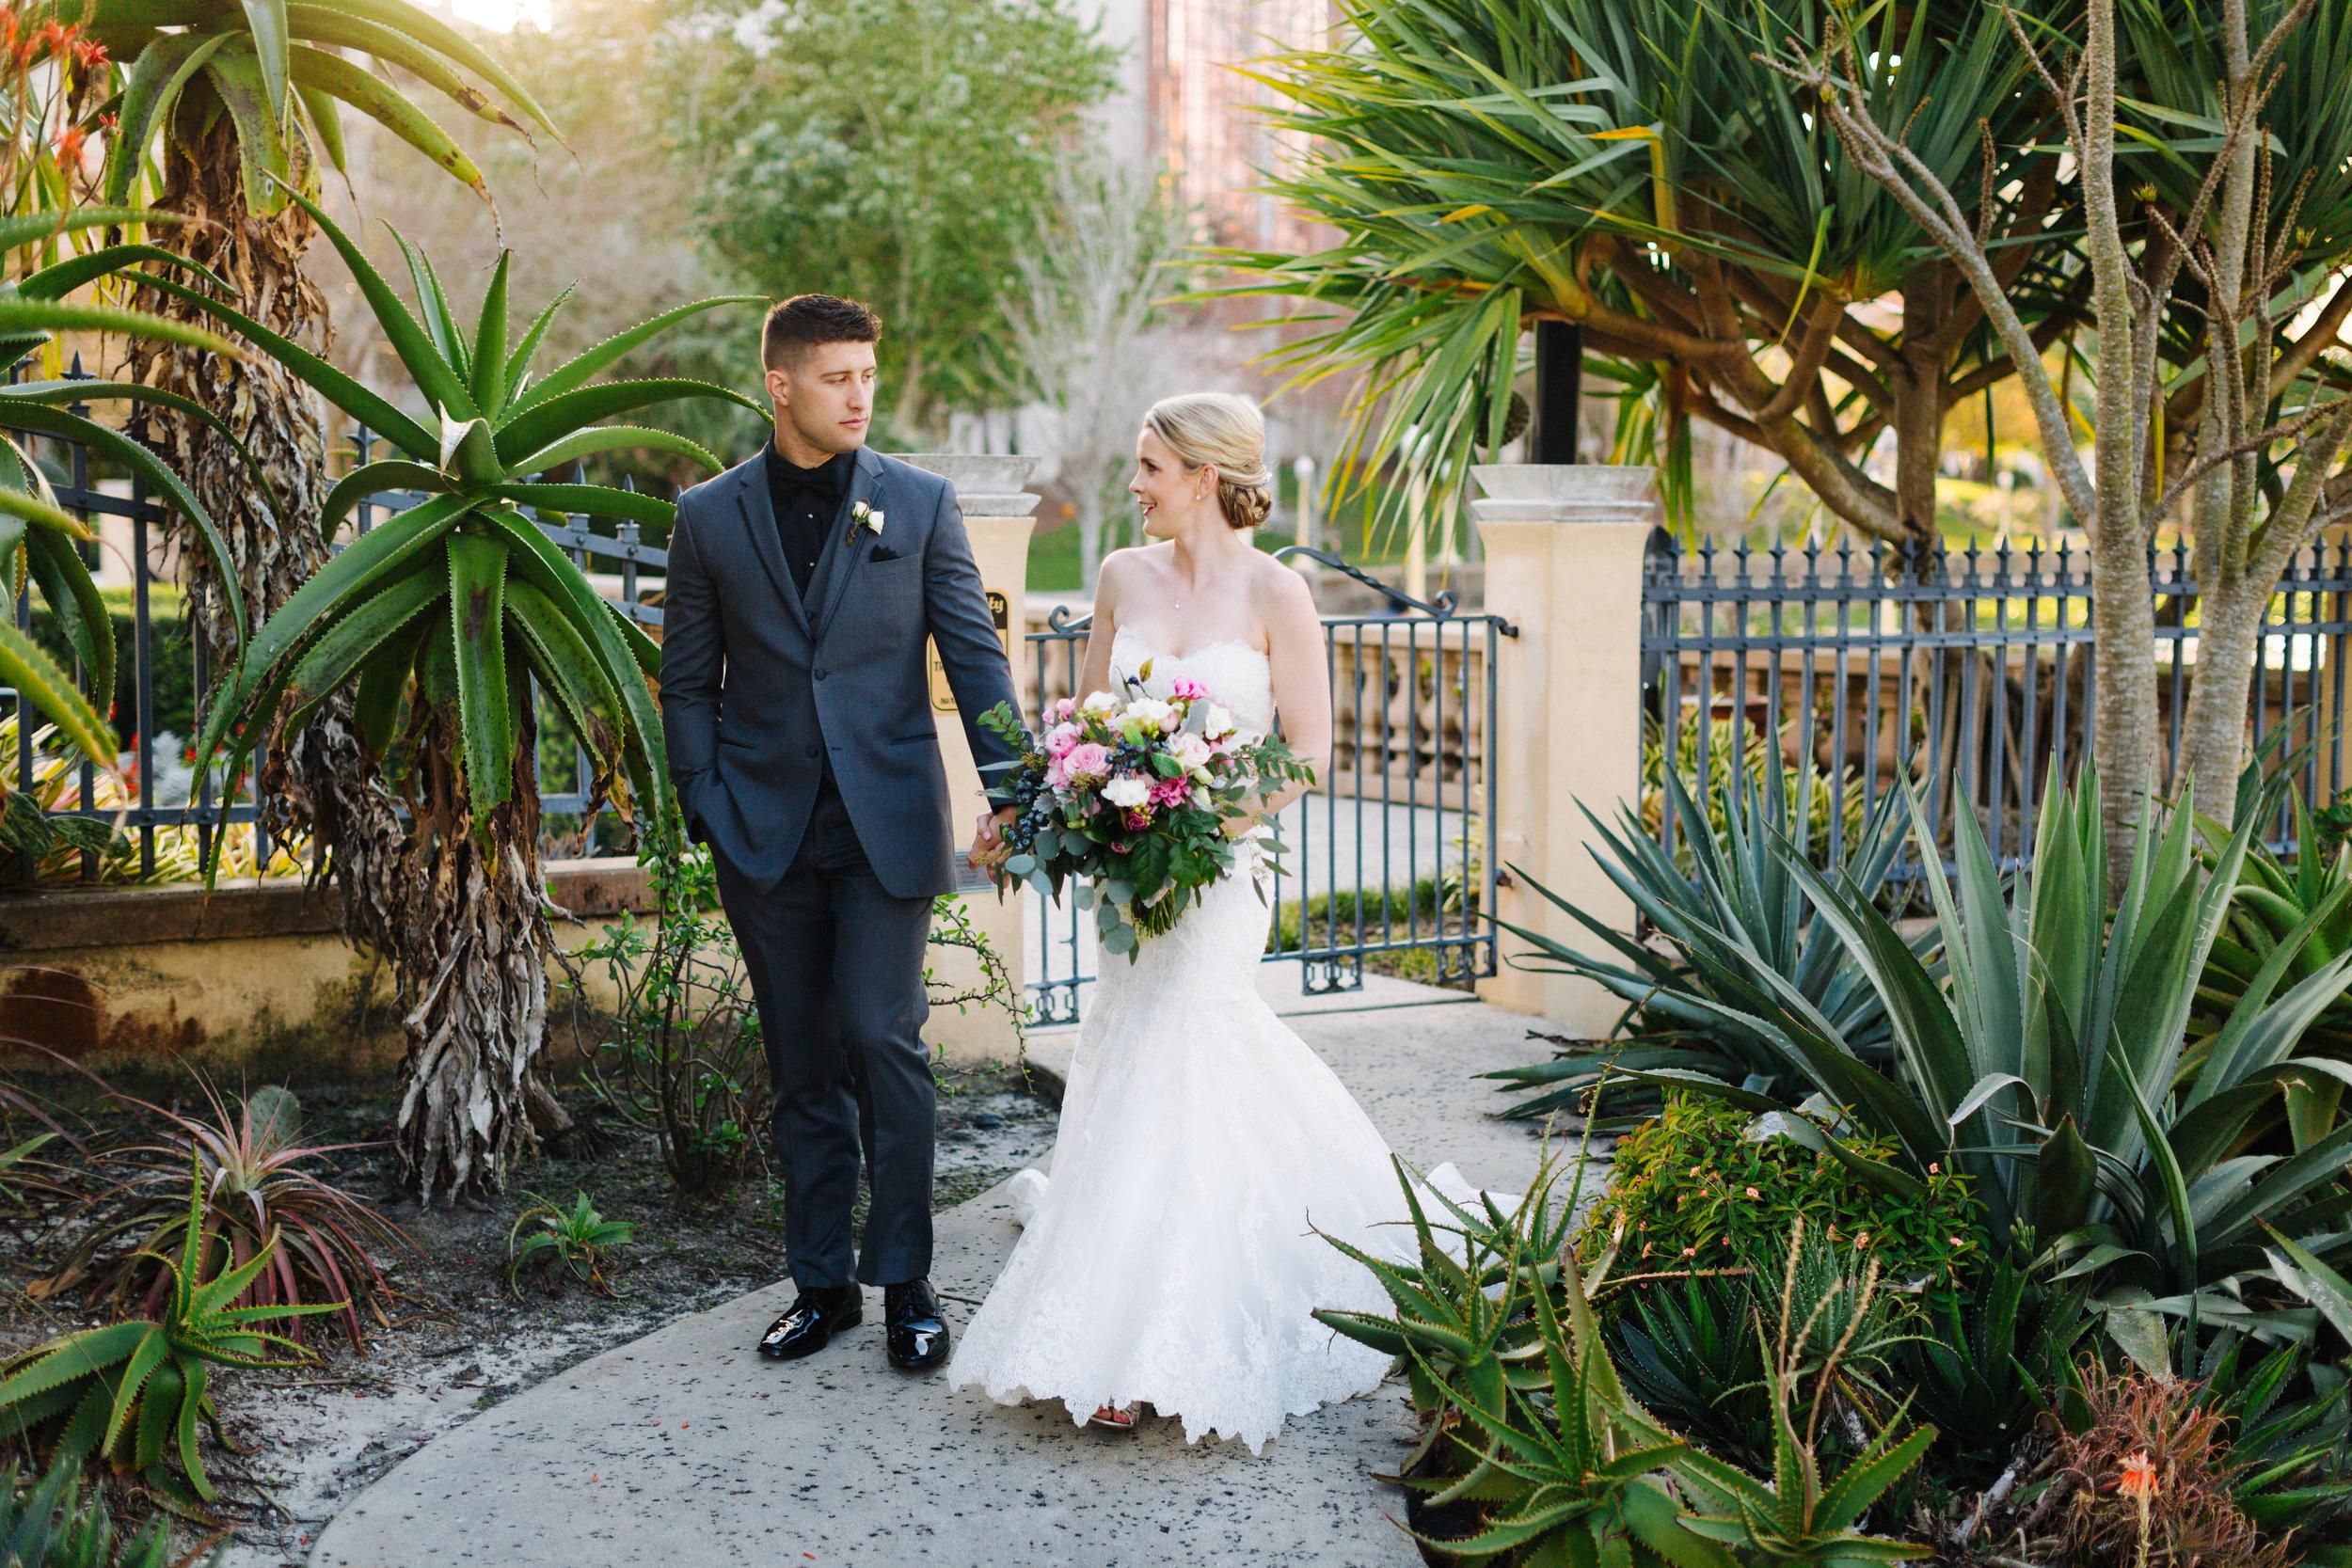 hollis gardens wedding downtown lakeland wedding jake and katie photography-34.jpg